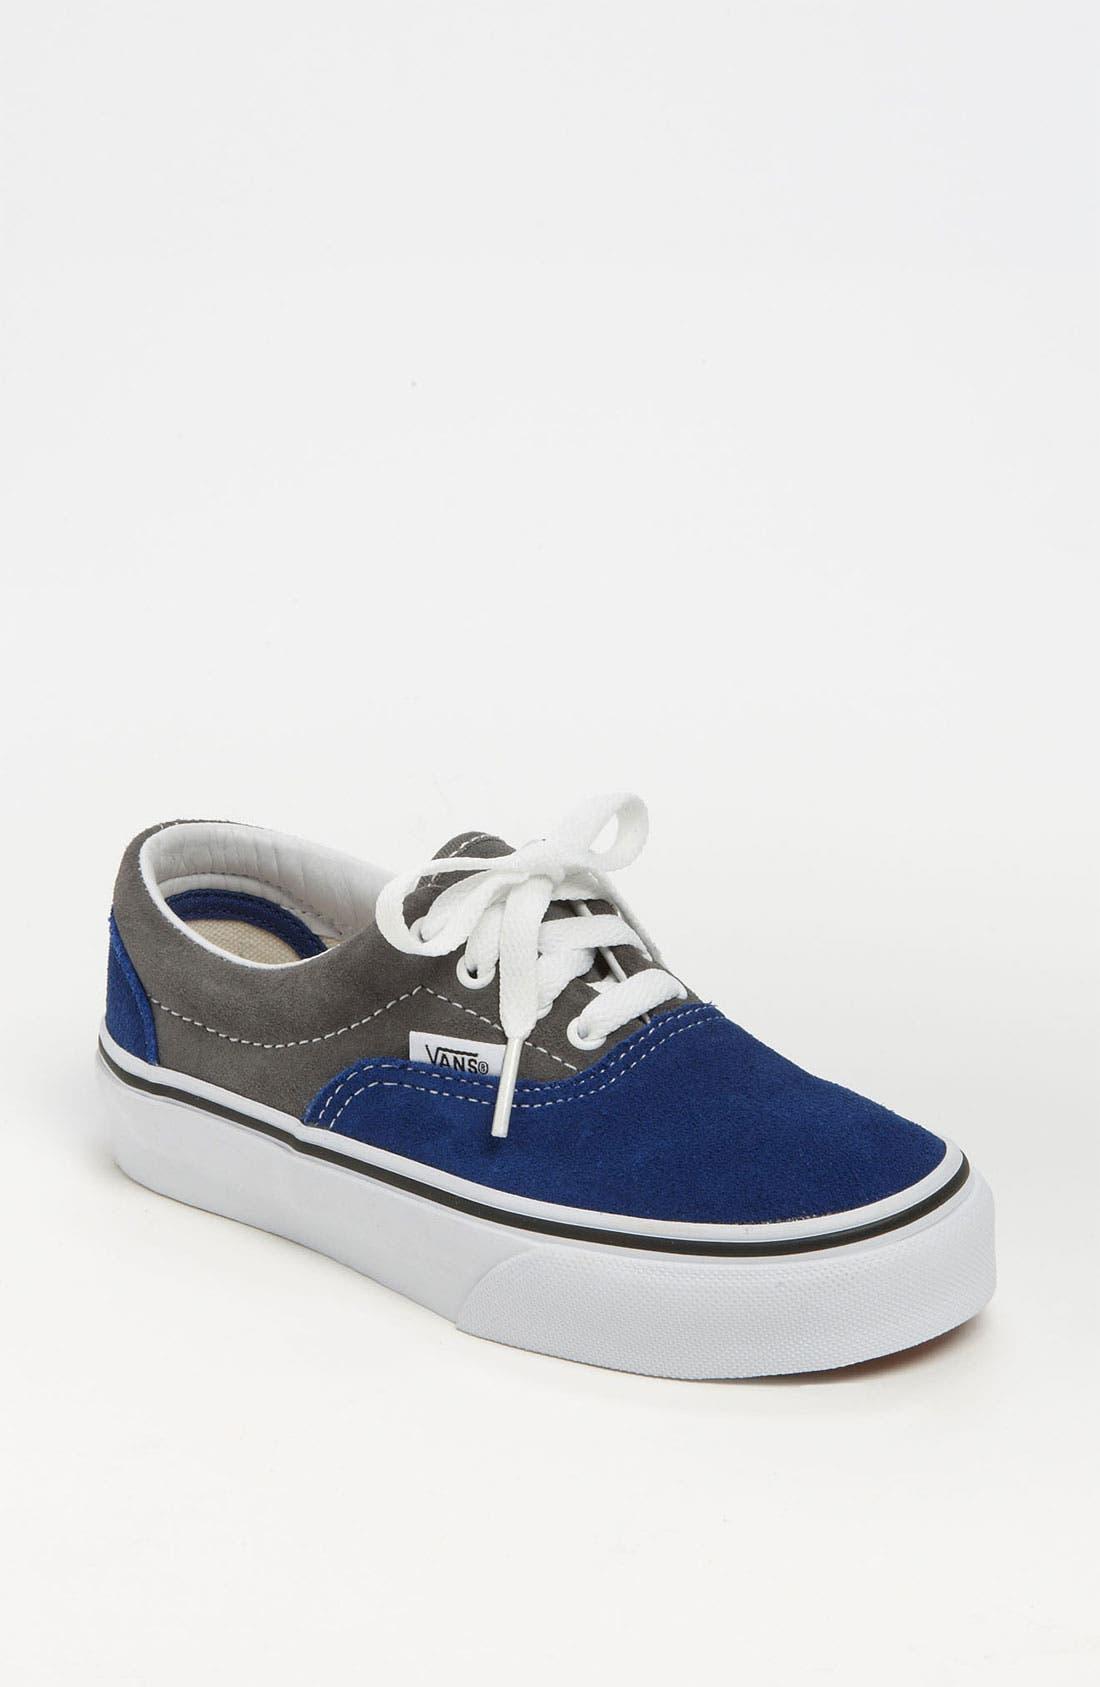 Alternate Image 1 Selected - Vans 'Era' Sneaker (Toddler, Little Kid & Big Kid)